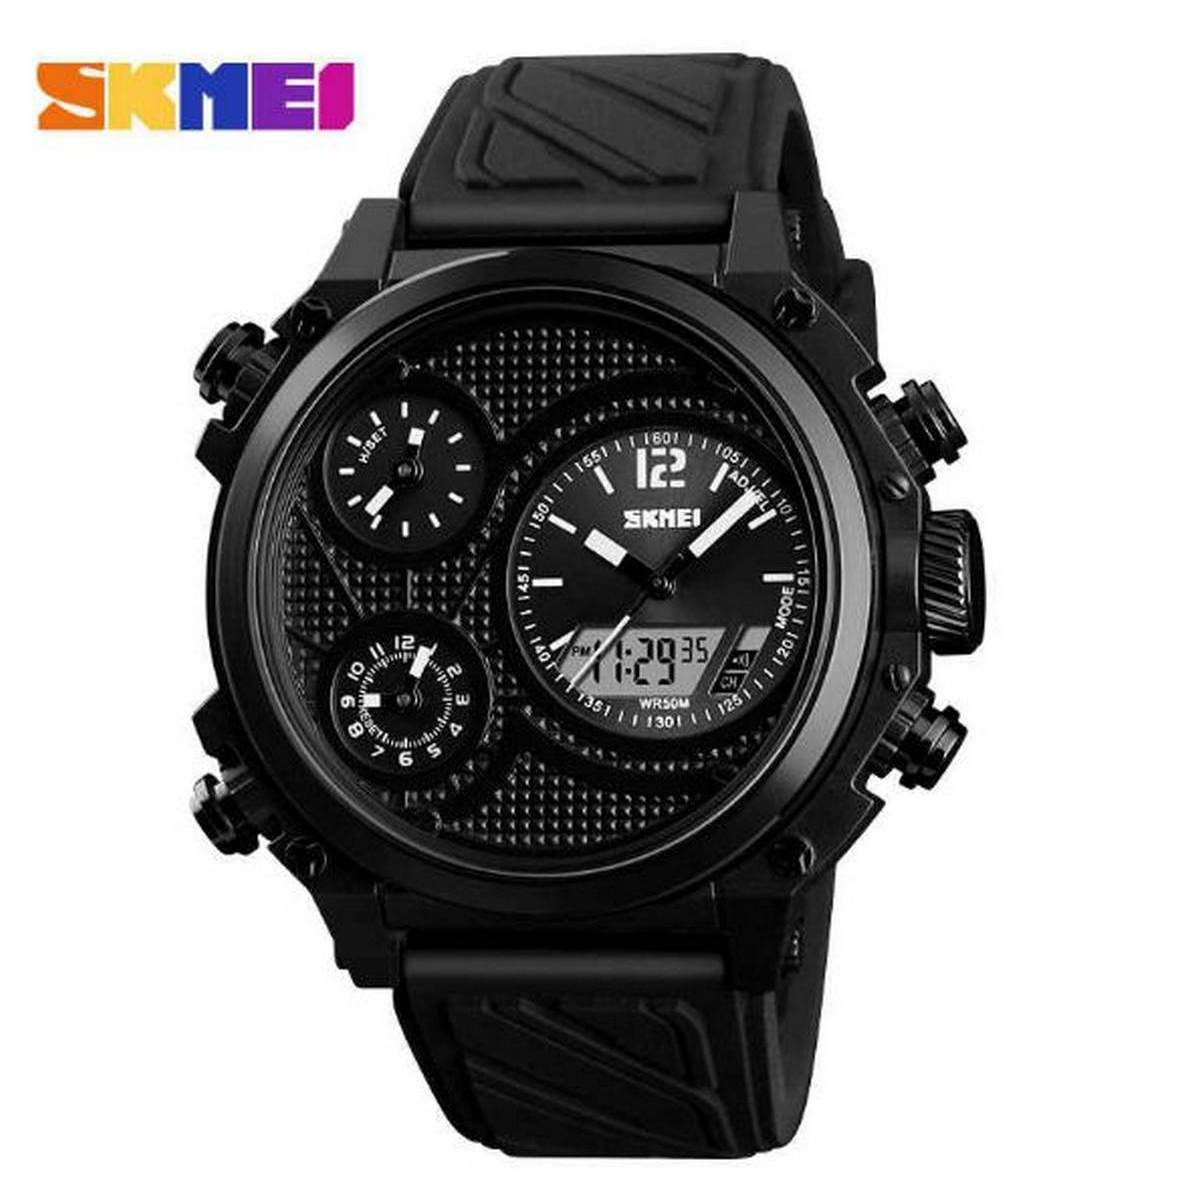 [with skmei box] Skmei Dual Display Watch  for men